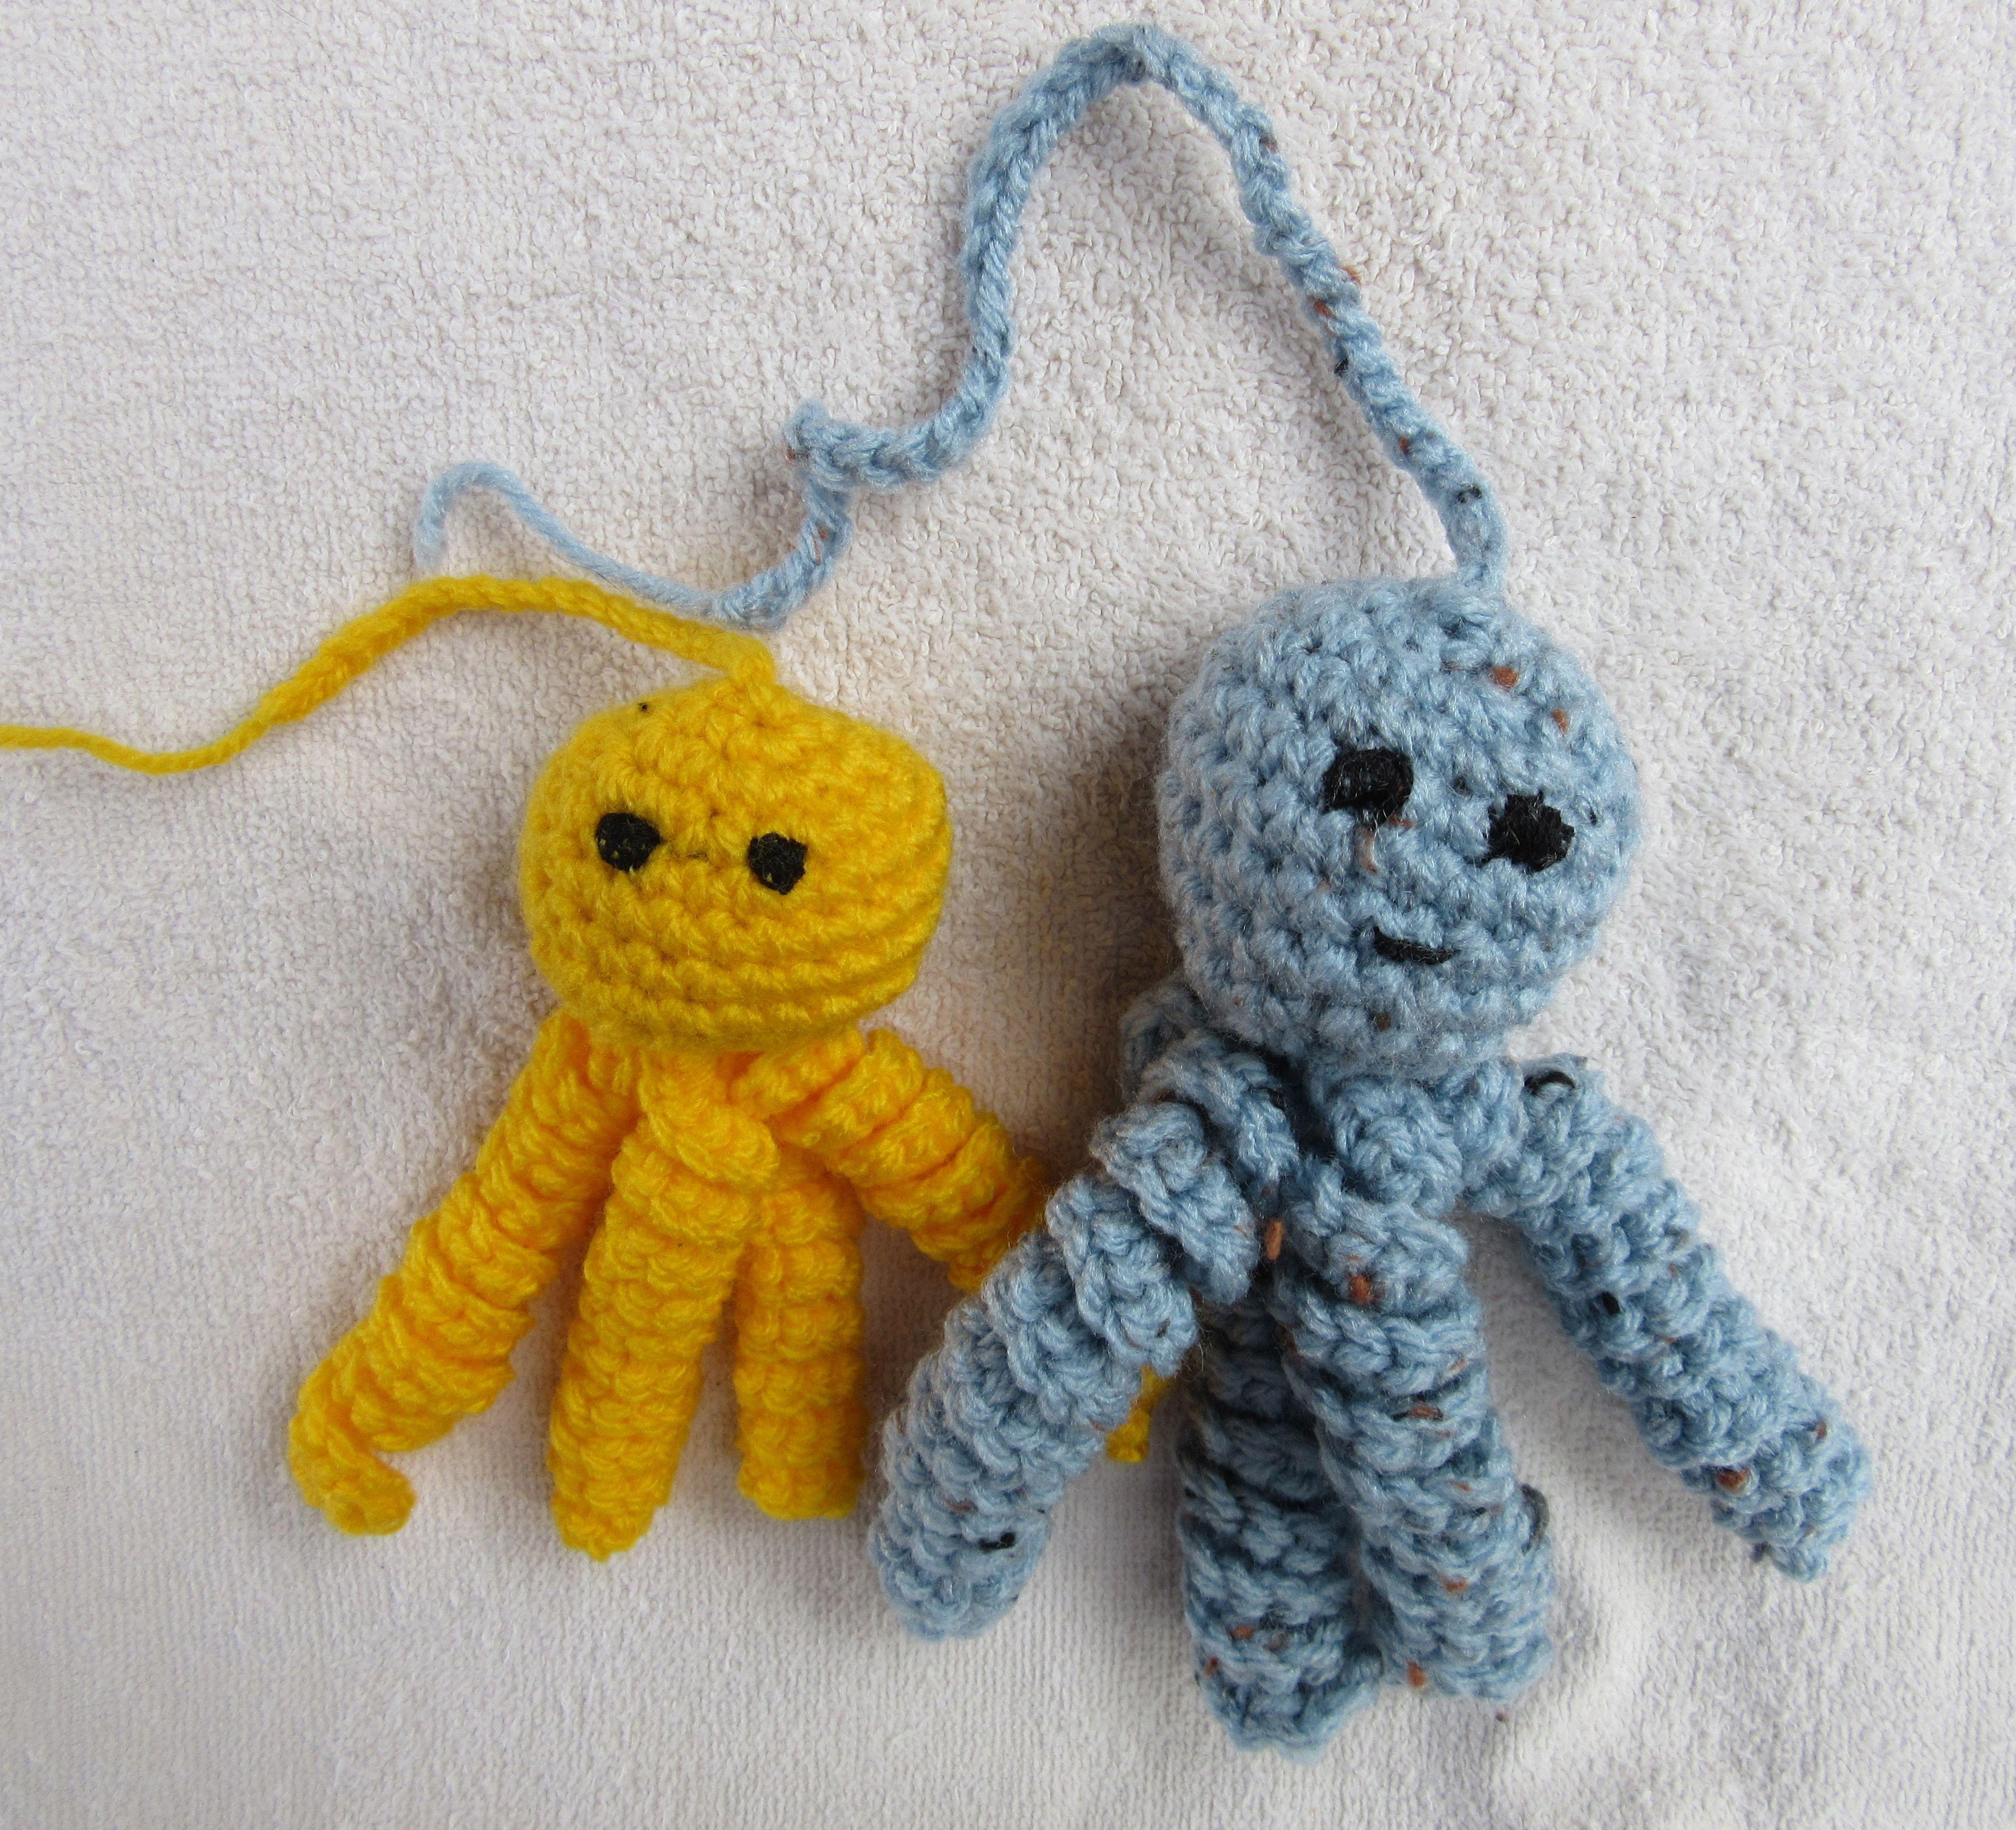 Octo Octo Cat Toy Free Crochet Pattern By Kathy Kelly Crochetbird Stuffed Toys Patterns Crochet Cat Toys Crochet Toys Patterns